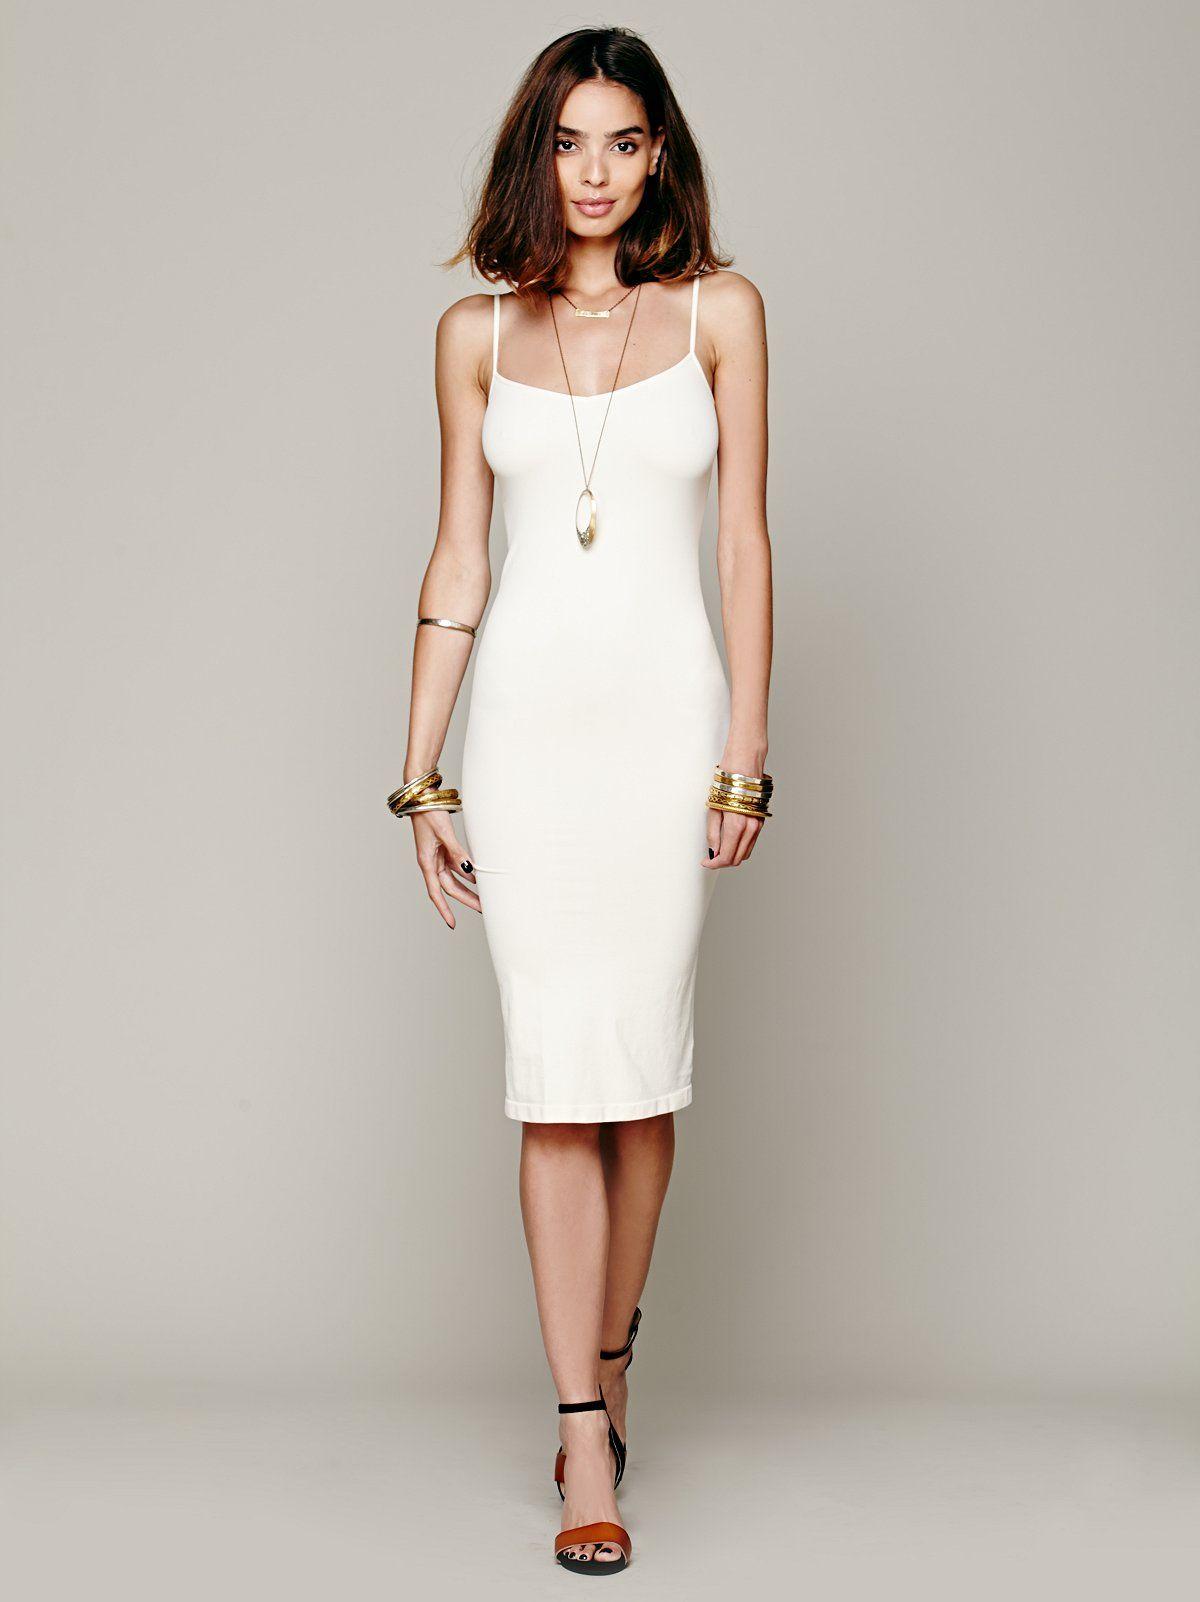 Tea Length Seamless Slip In 2021 Affordable White Dresses Seamless Slip Stretchy Dress [ 1602 x 1200 Pixel ]